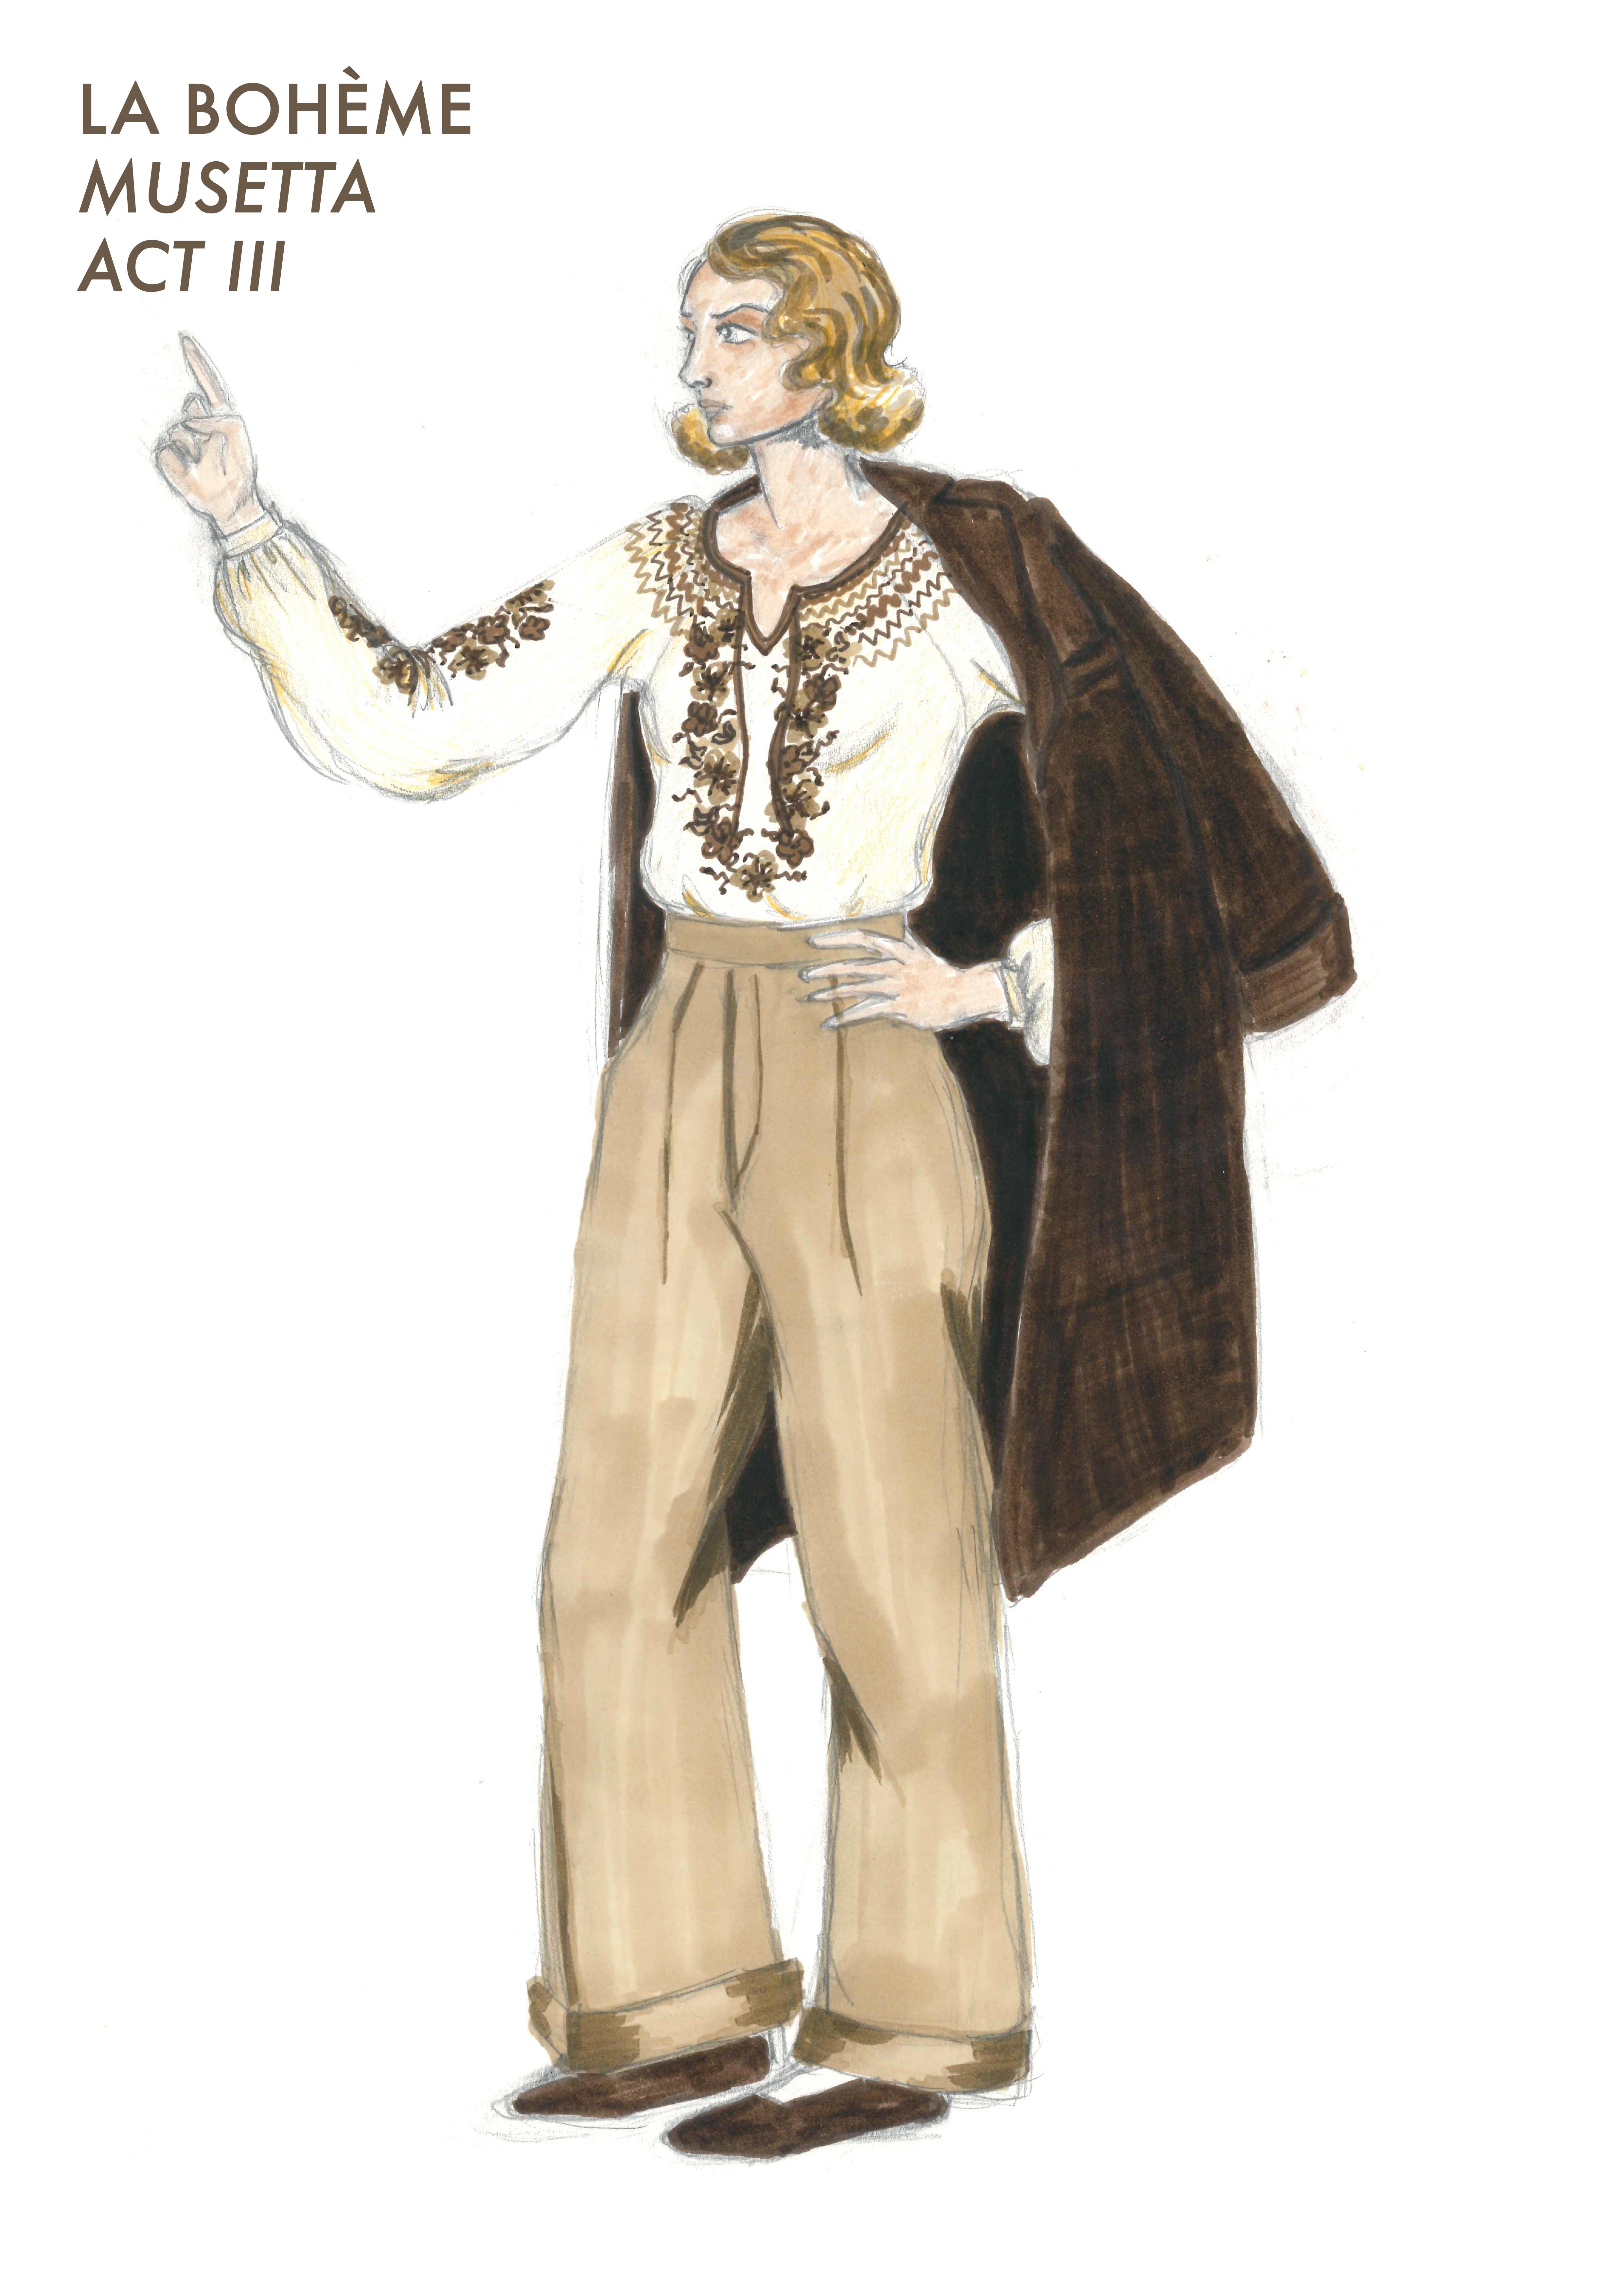 Musetta act 3